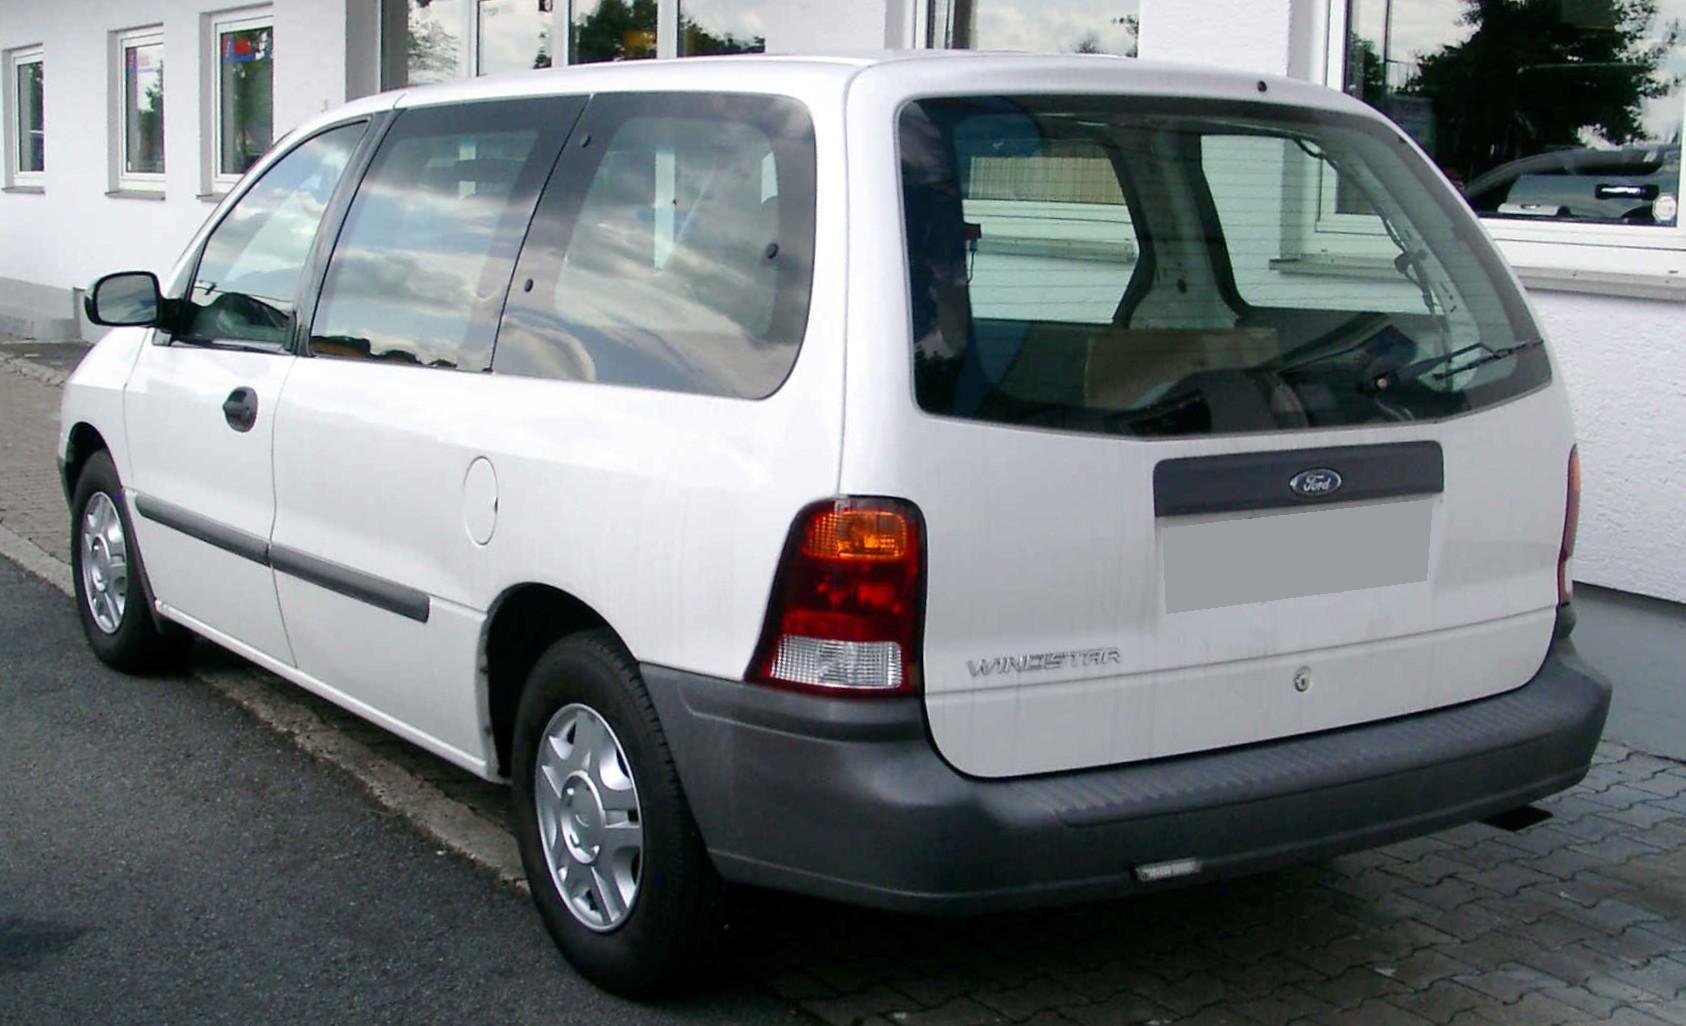 ford windstar wikipedia    ford cars